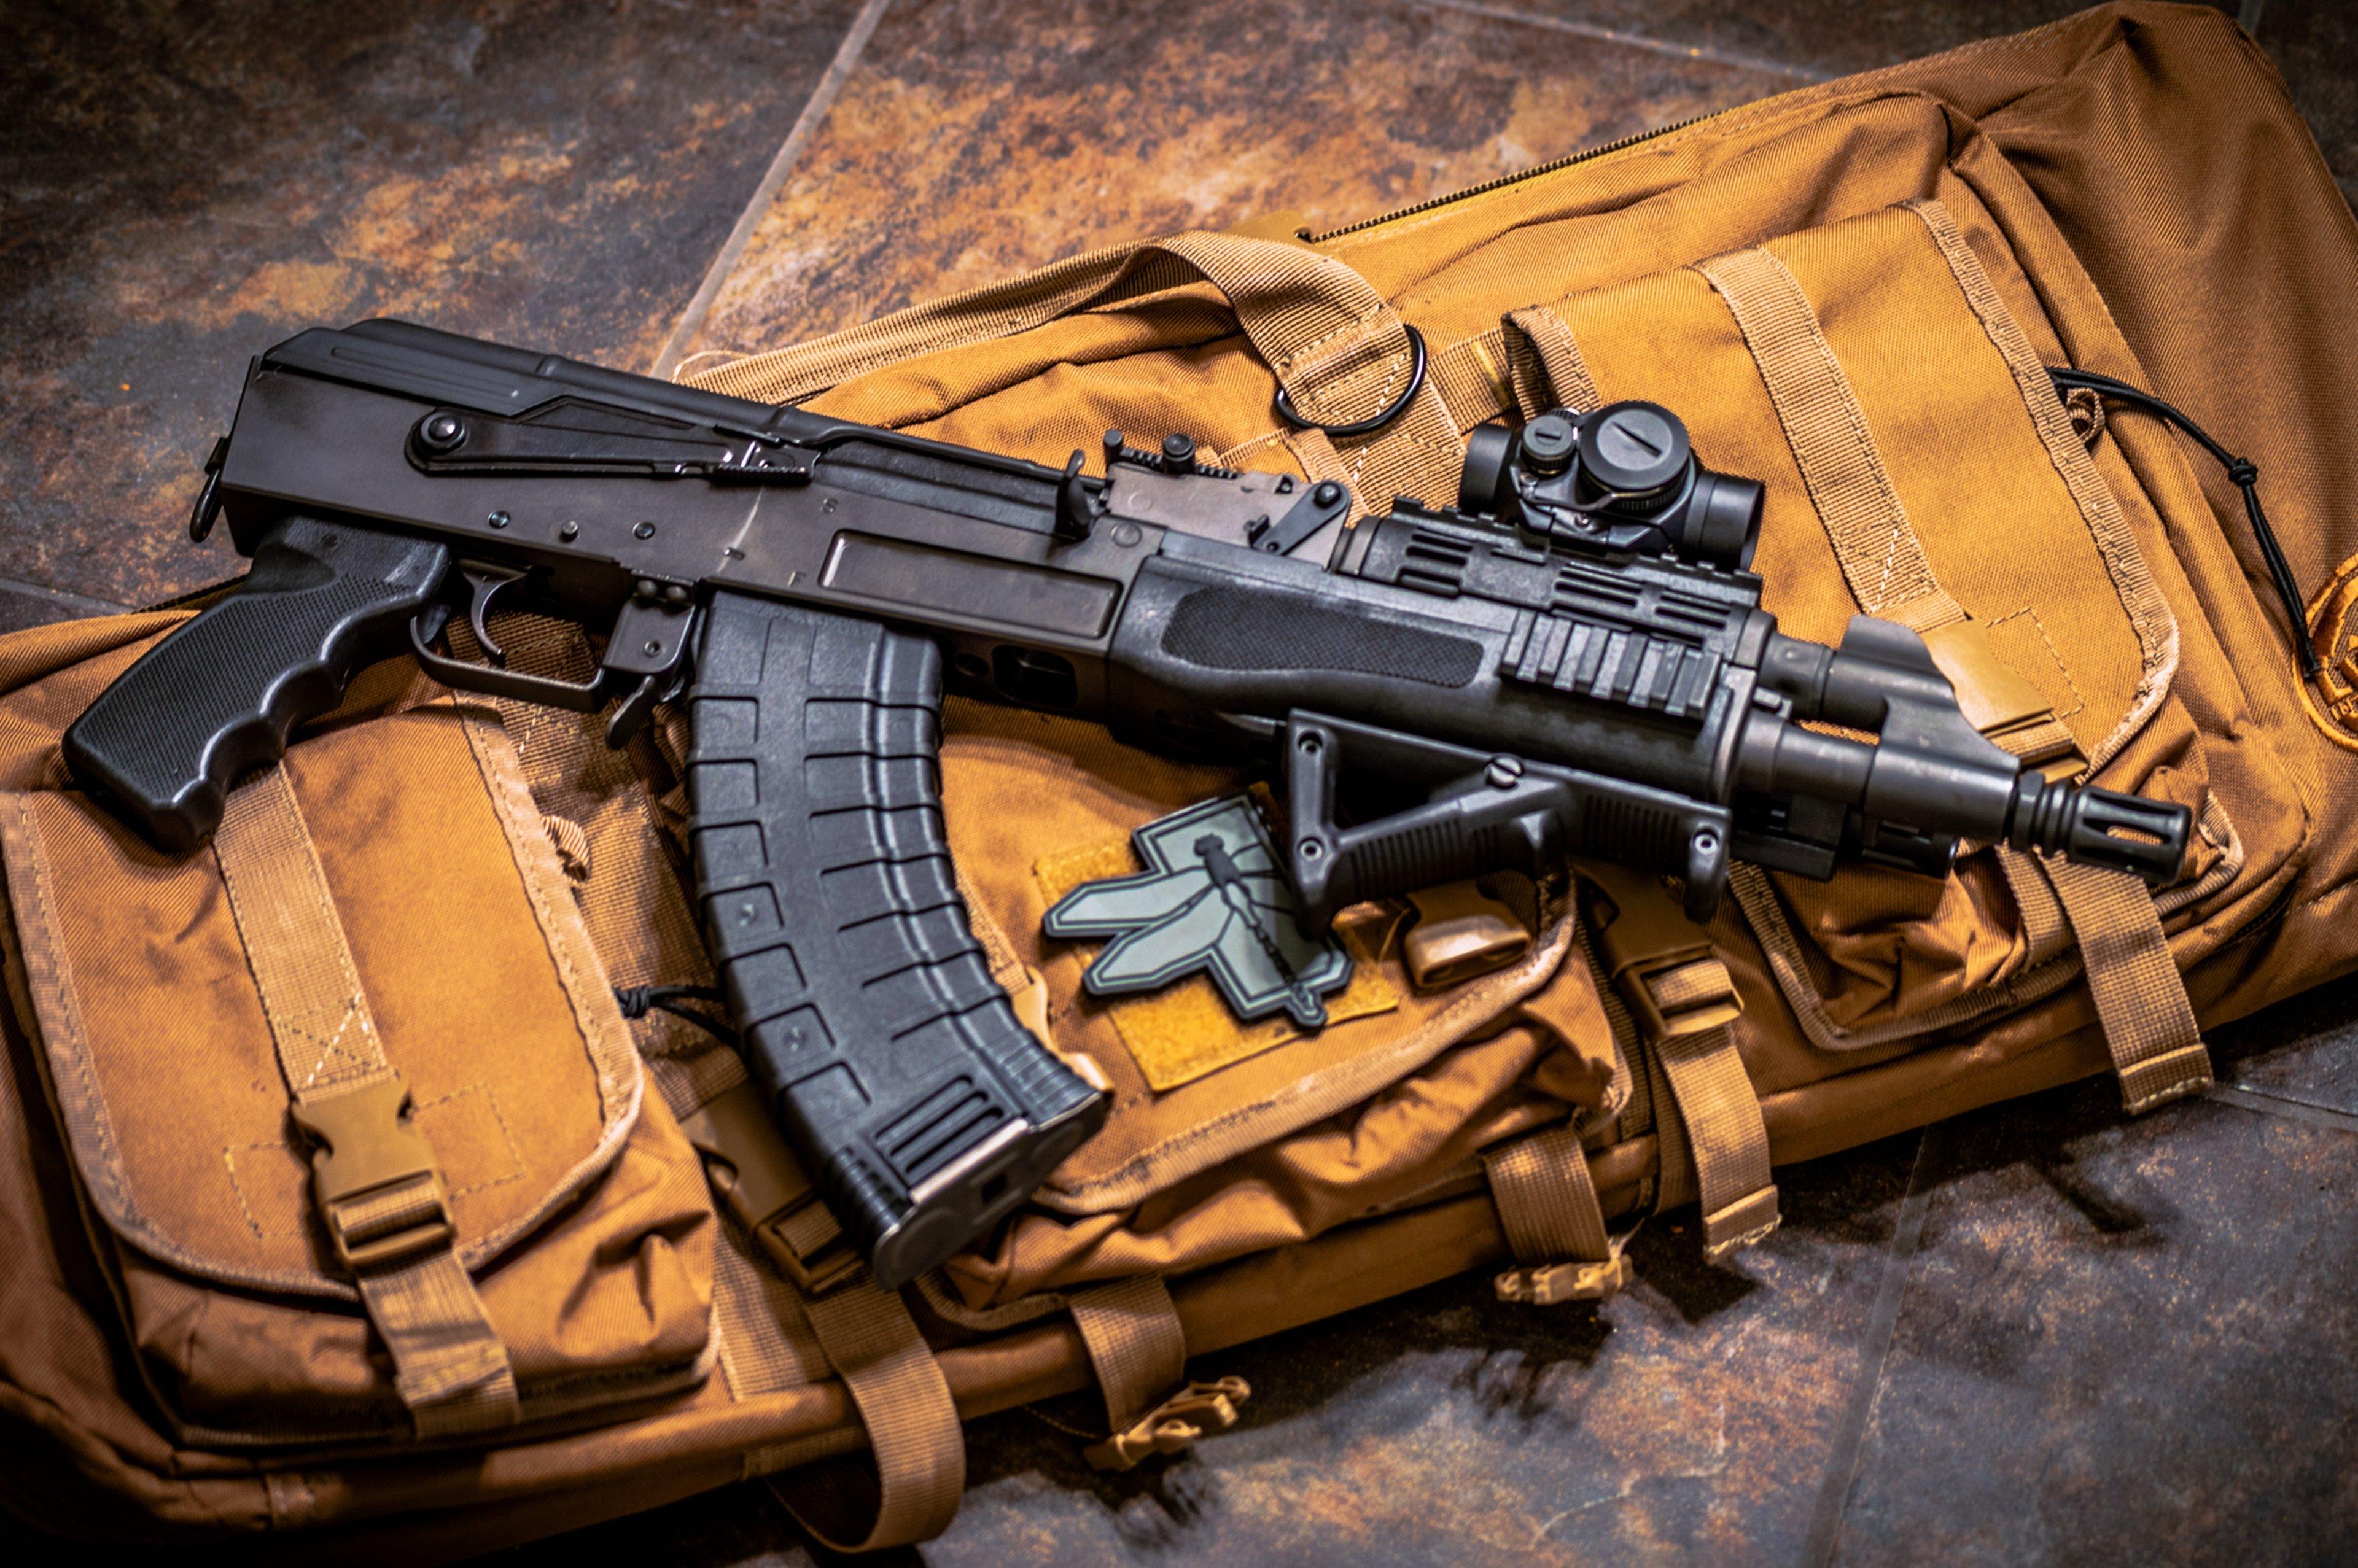 AKS 74U Machine Gun Weapon Wars Army Military Bag Wallpaper